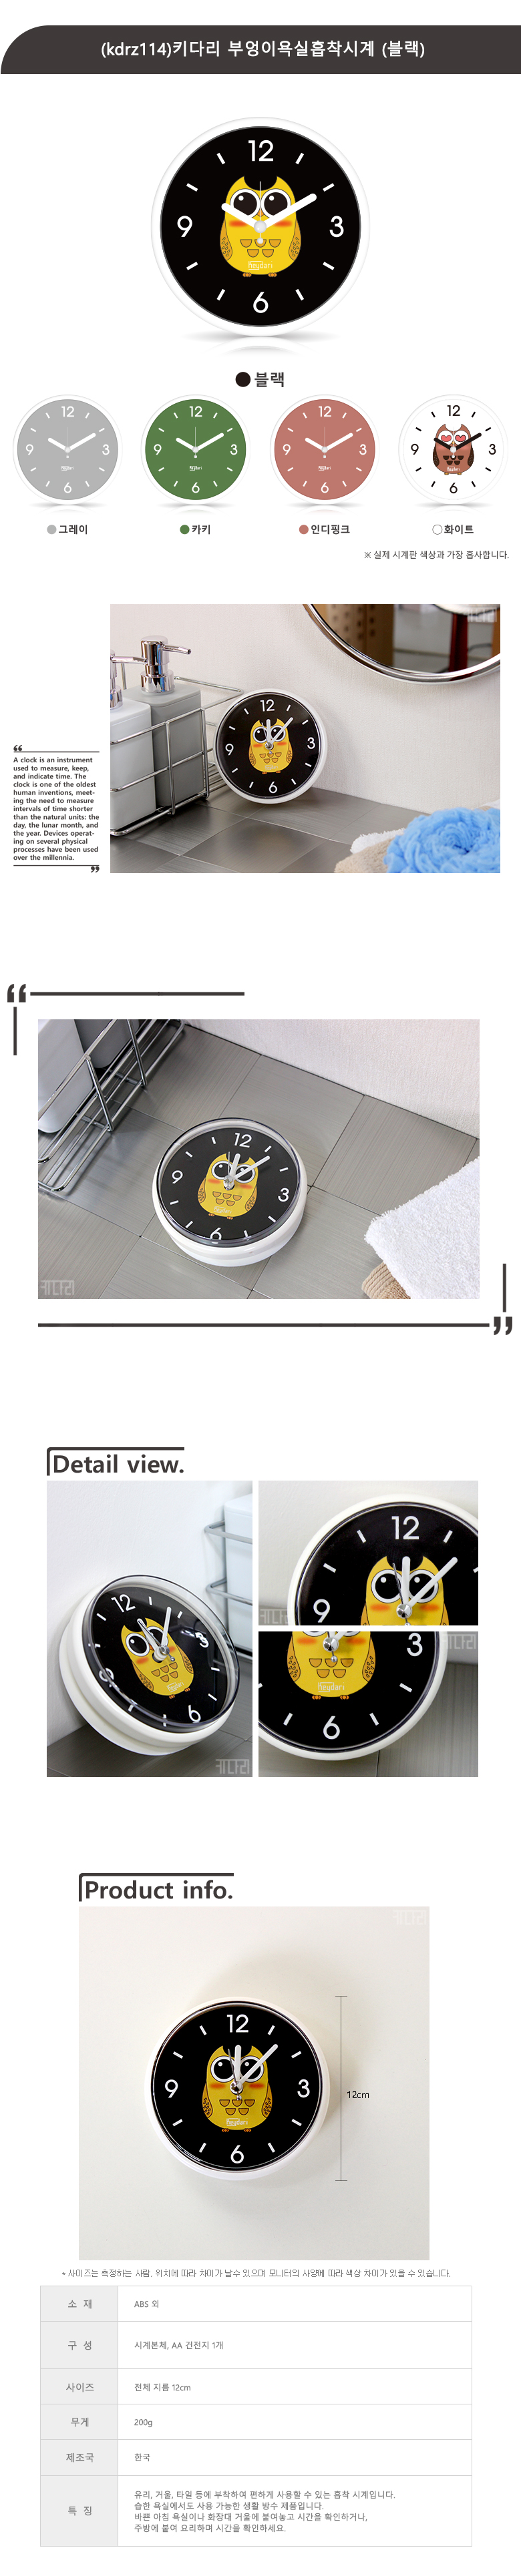 (kdrz114)키다리 부엉이욕실흡착시계 (블랙)8,900원-키다리인테리어, 시계, 벽시계, 흡착바보사랑(kdrz114)키다리 부엉이욕실흡착시계 (블랙)8,900원-키다리인테리어, 시계, 벽시계, 흡착바보사랑